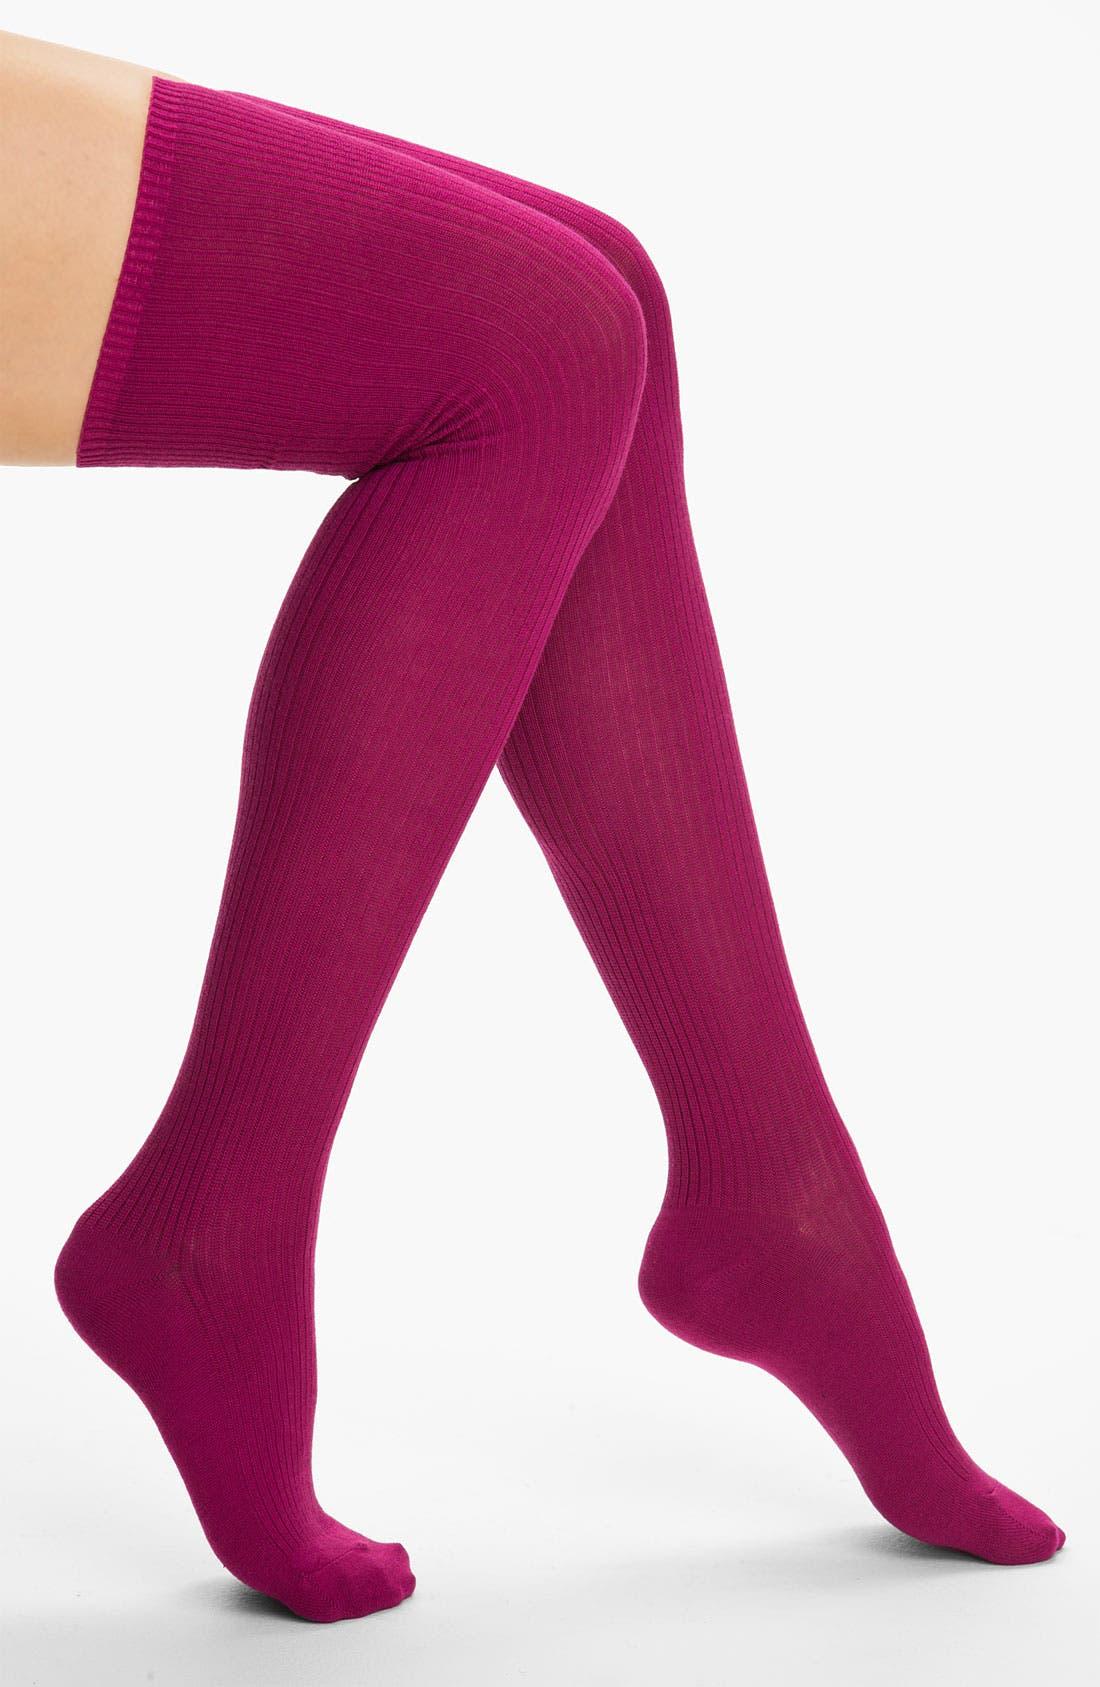 Main Image - Hue Ribbed Over the Knee Socks